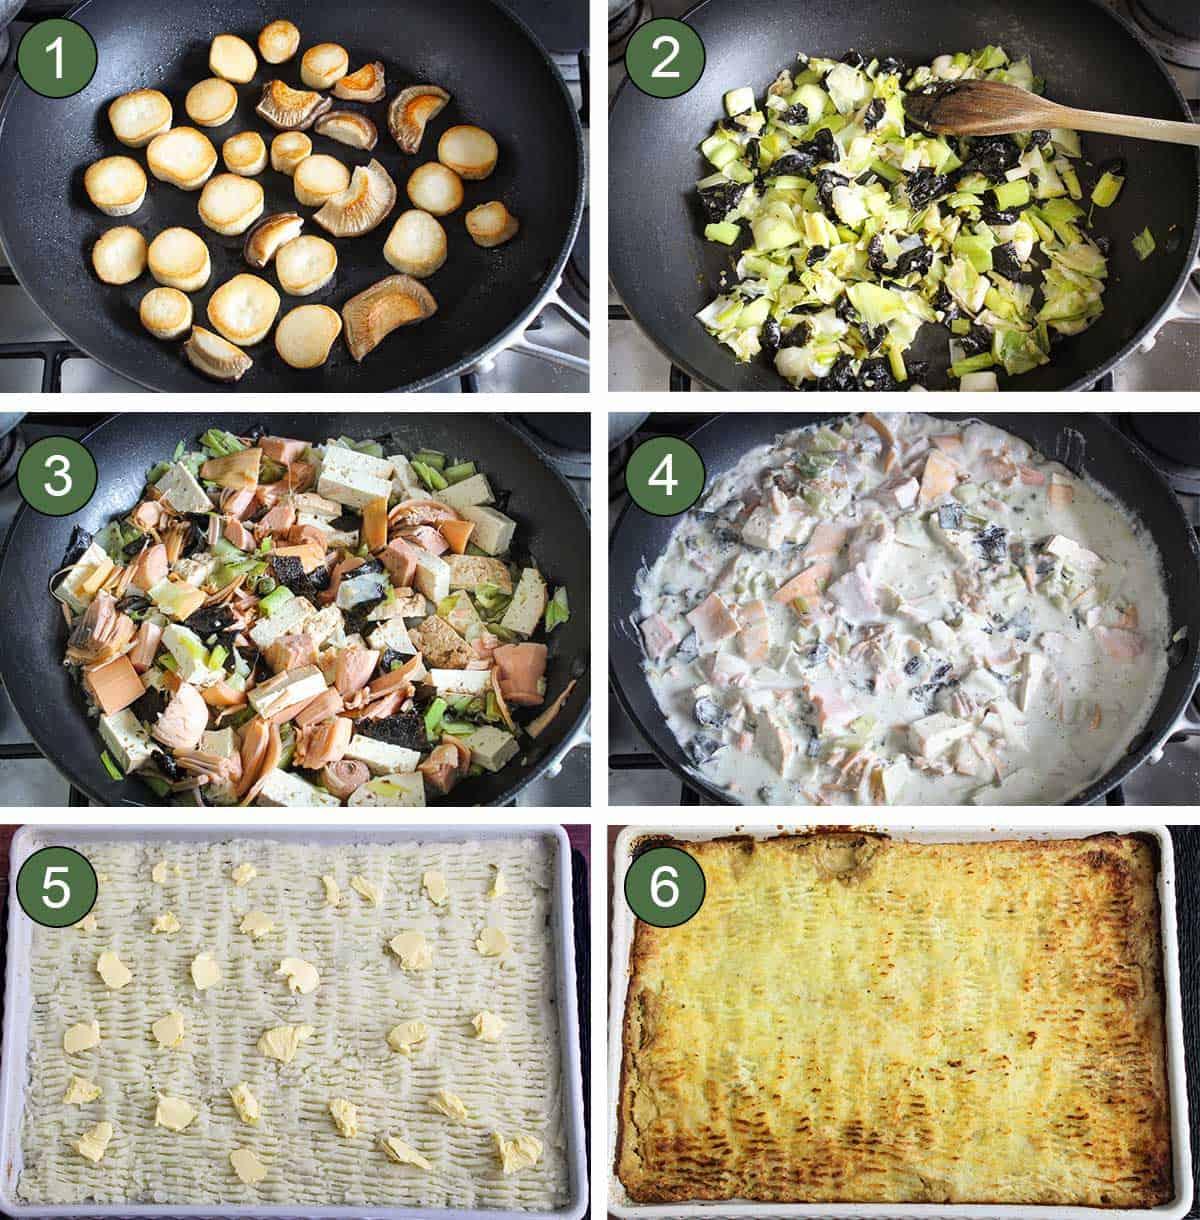 Cooking Process Shots Showing How to Make Vegan Fish Pie